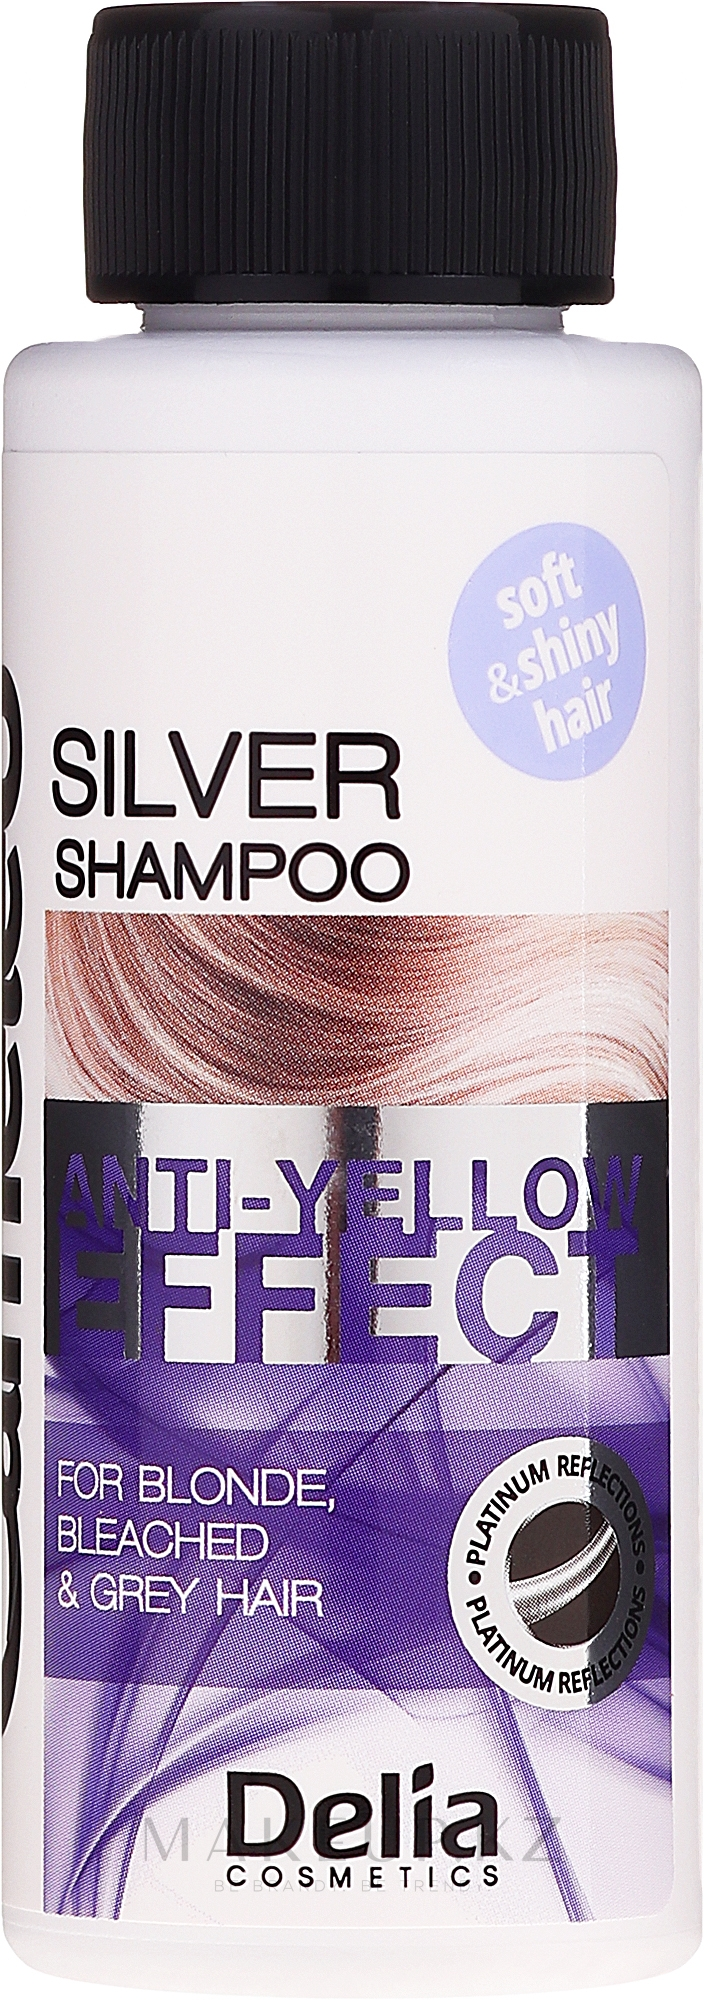 "Шампунь для светлых волос ""Silver"" - Delia Cosmetics Cameleo Silver Shampoo — фото 50 ml"